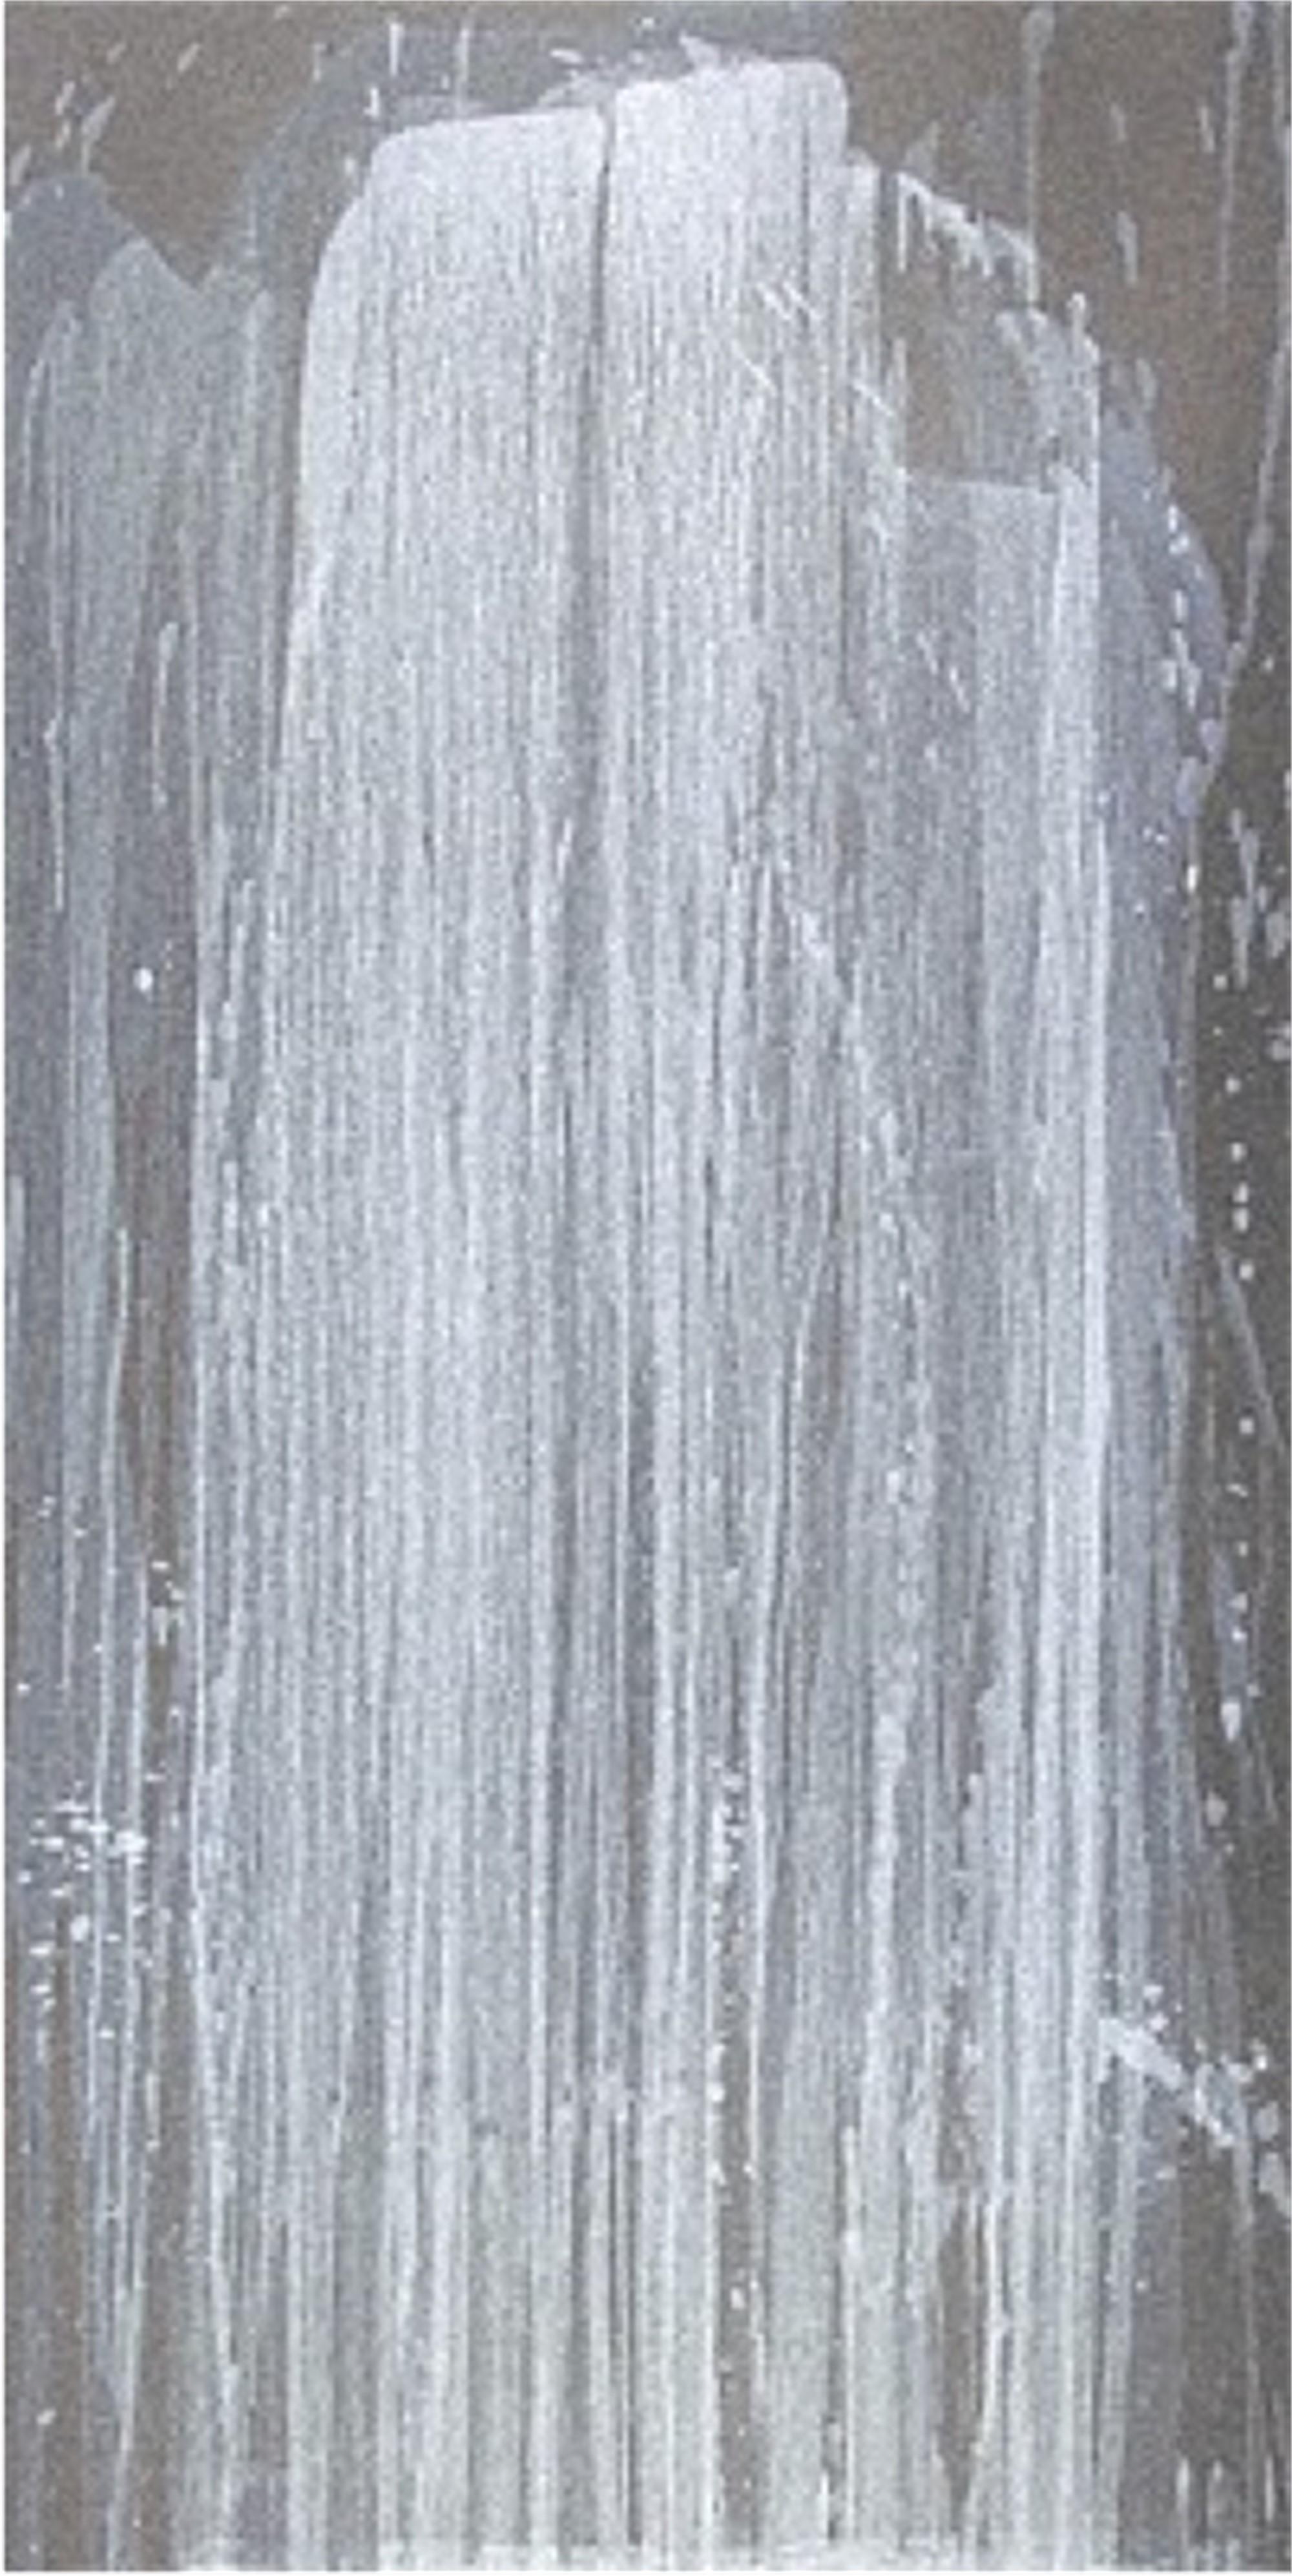 Silver Waterfall by Pat Steir